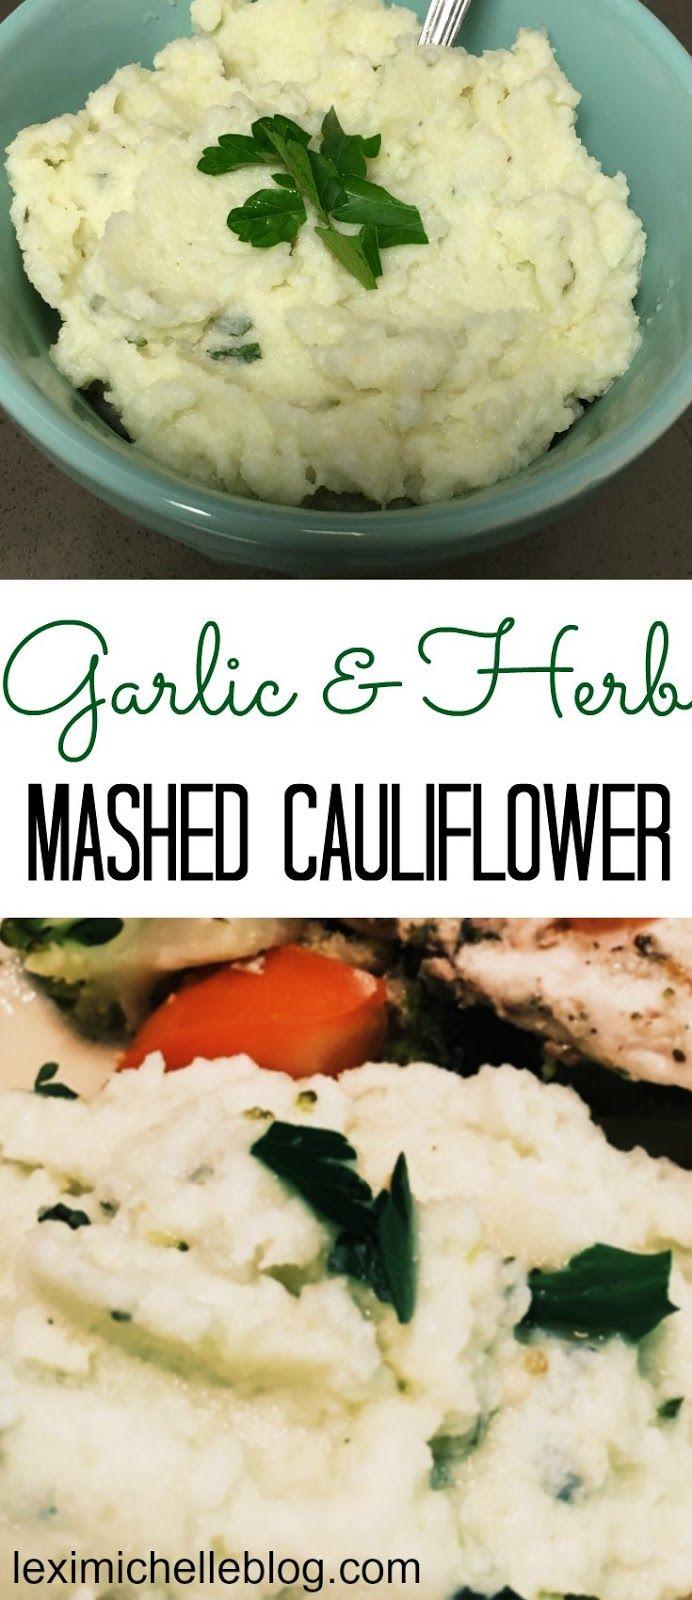 Garlic & Herb Mashed Cauliflower- with iifym macro counts, the key to making tasty mashed cauliflower is extra seasoning! (macro friendly meal, diet food)